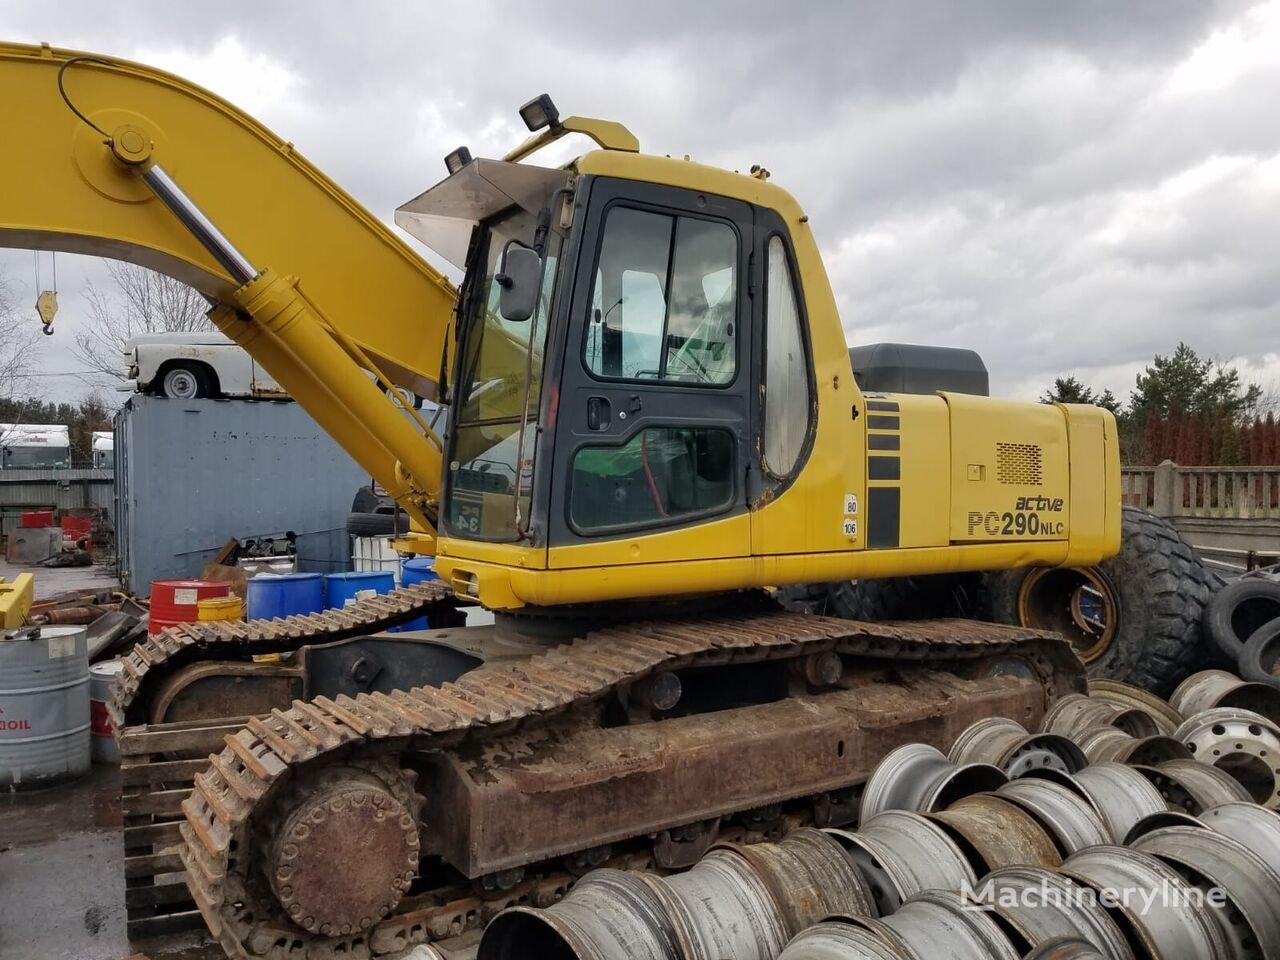 KOMATSU PC290 NLC-6K tracked excavator